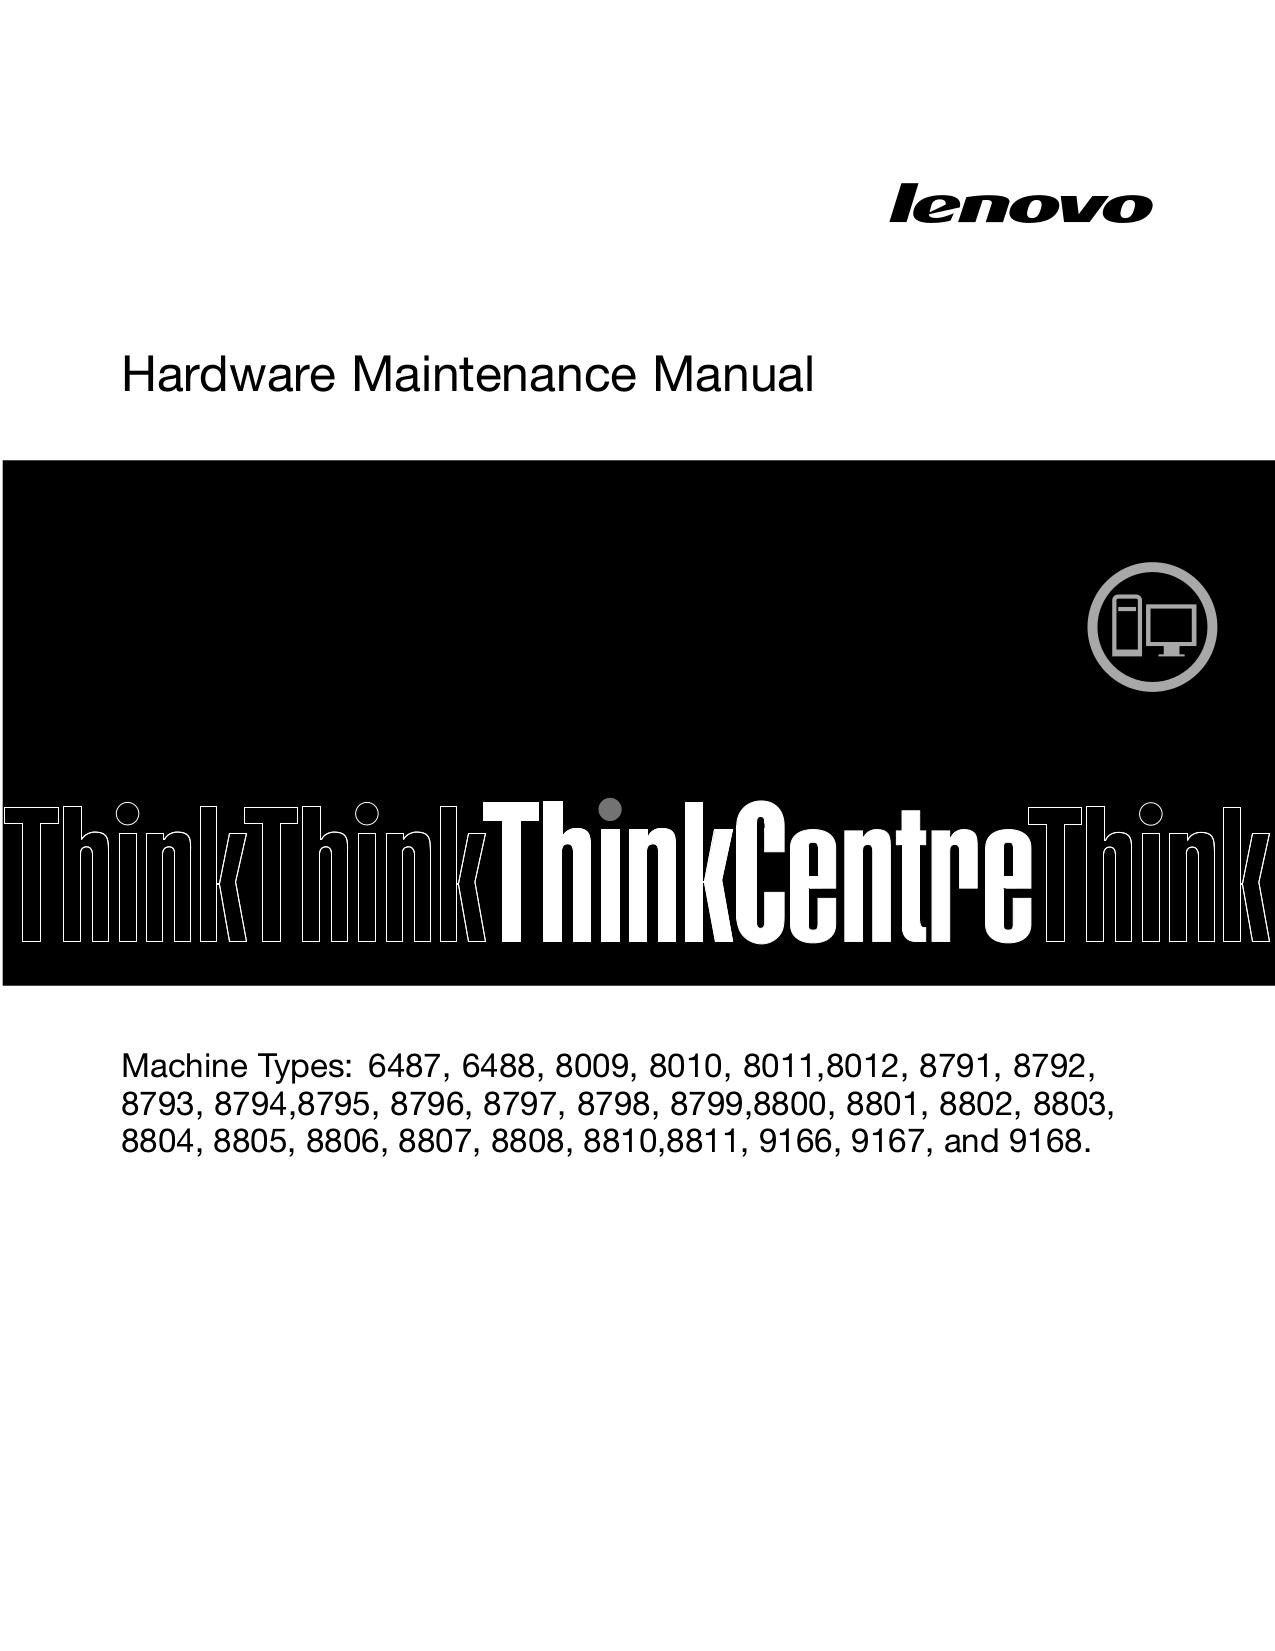 pdf for Lenovo Desktop ThinkCentre M55 8795 manual